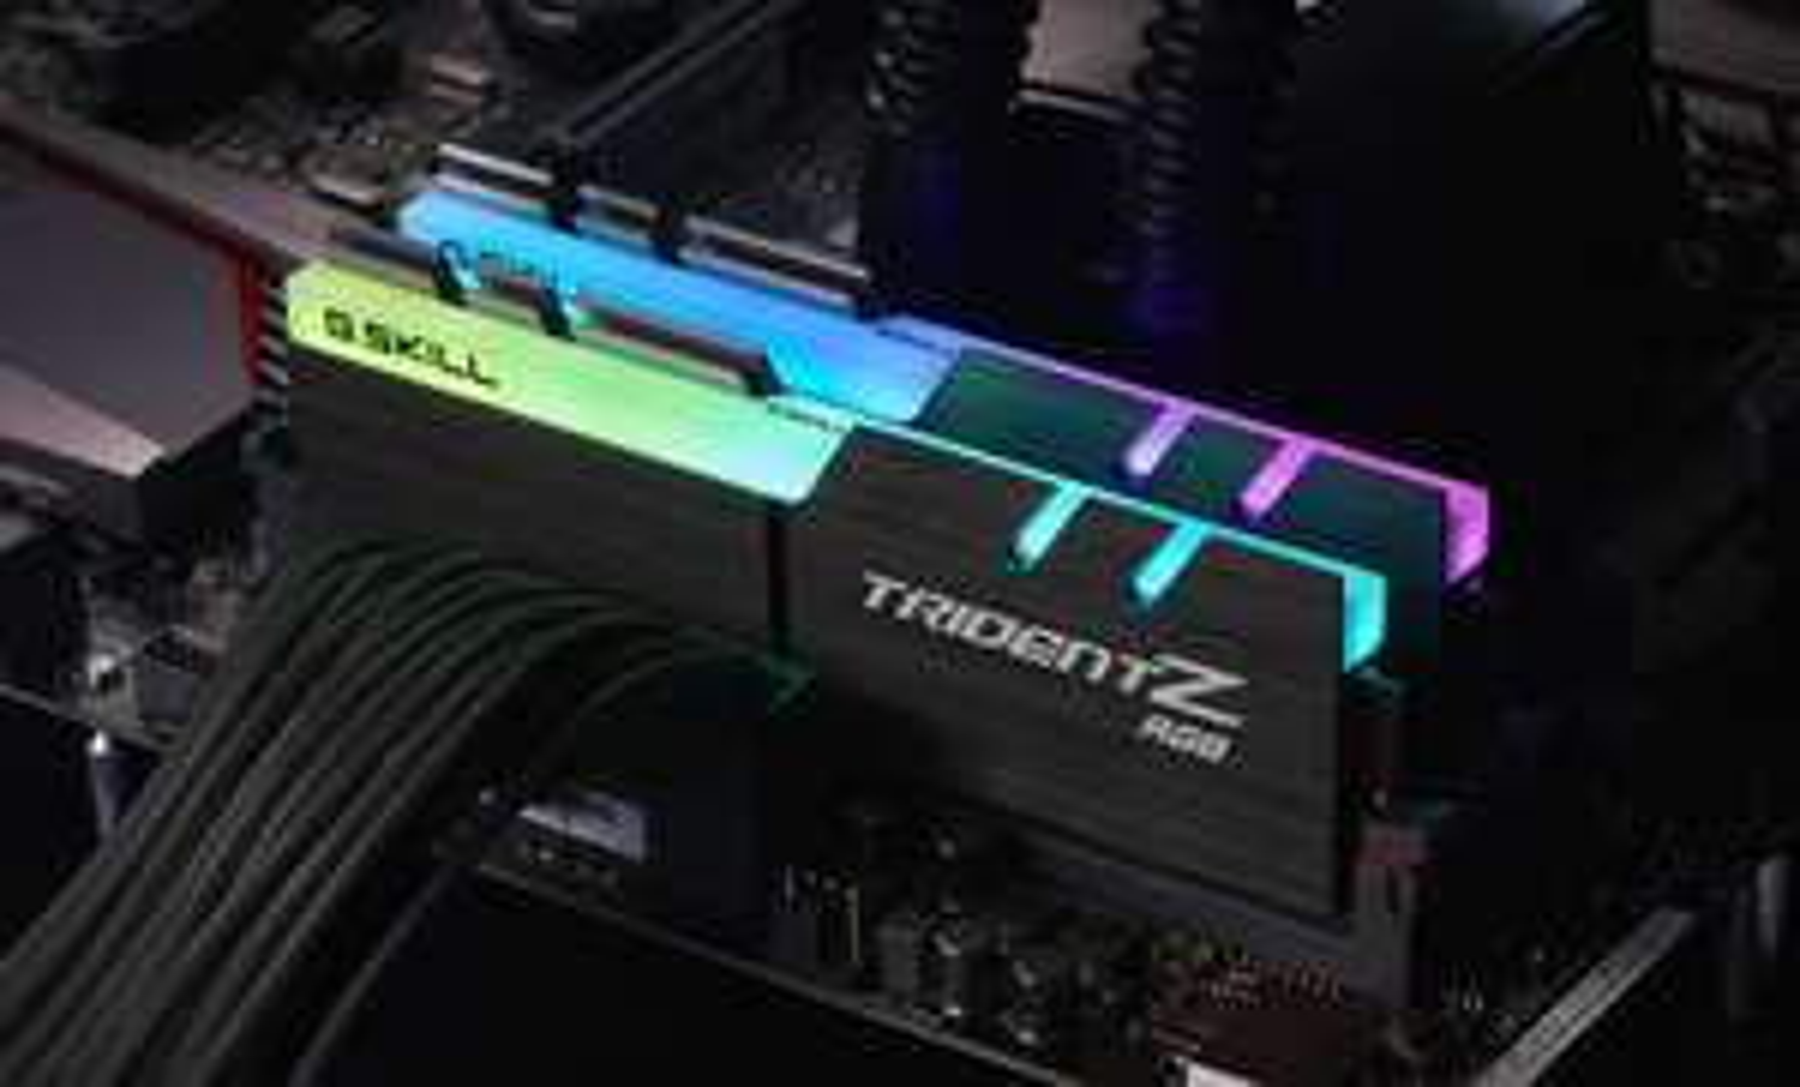 16gb G.Skill Trident Z RGB (2 x 8gb) 2400MHz £148.72 Amazon - Prime Exclusive